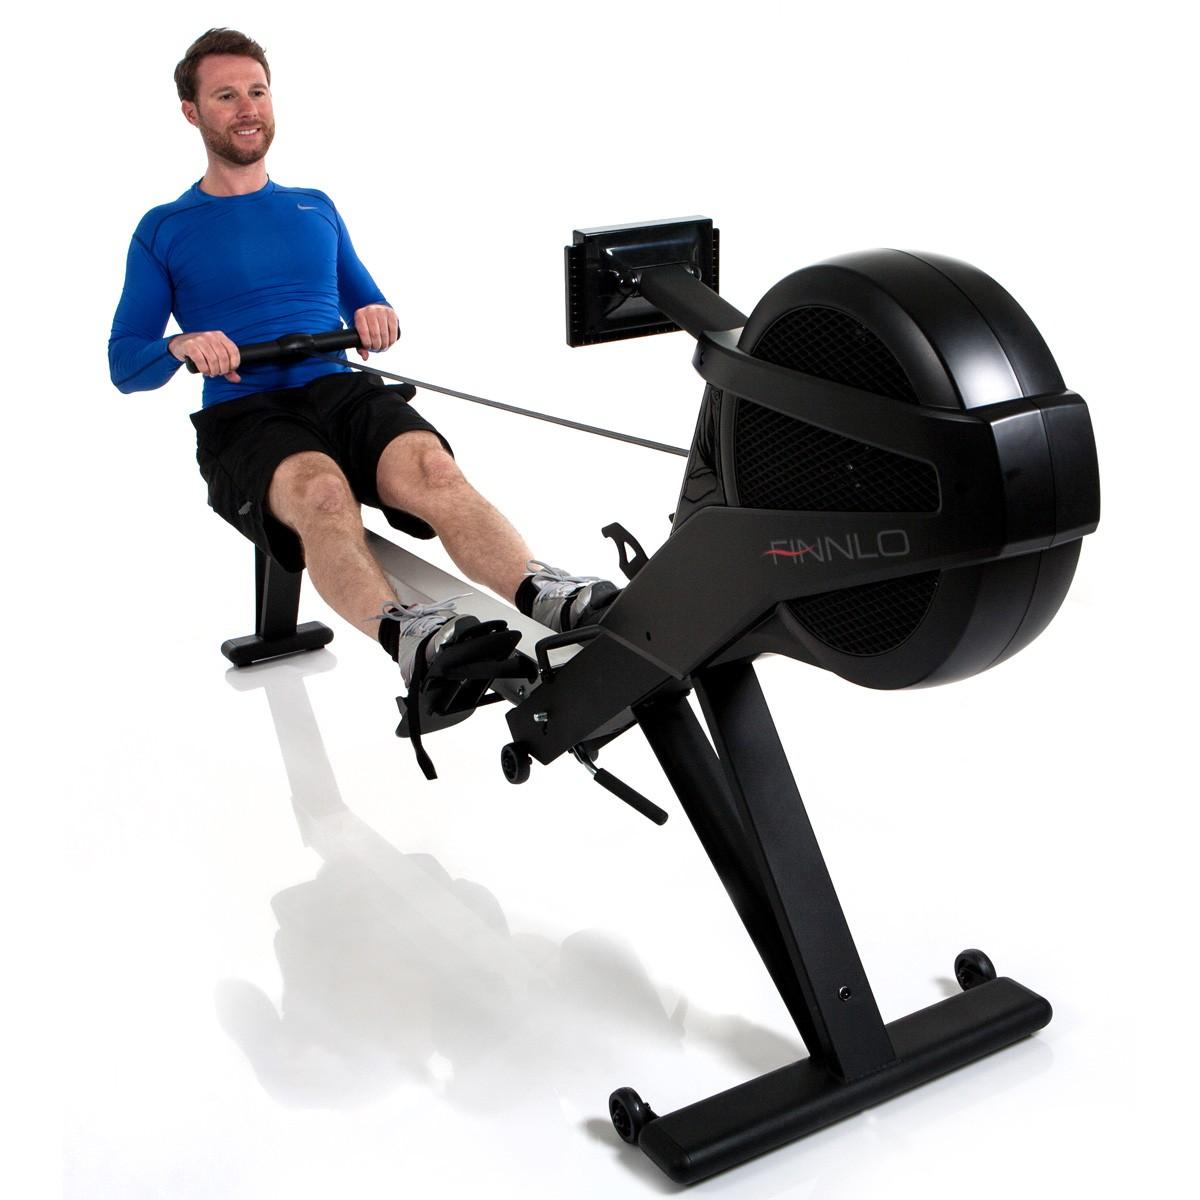 Finnlo Rower Aquon Evolution Buy Now